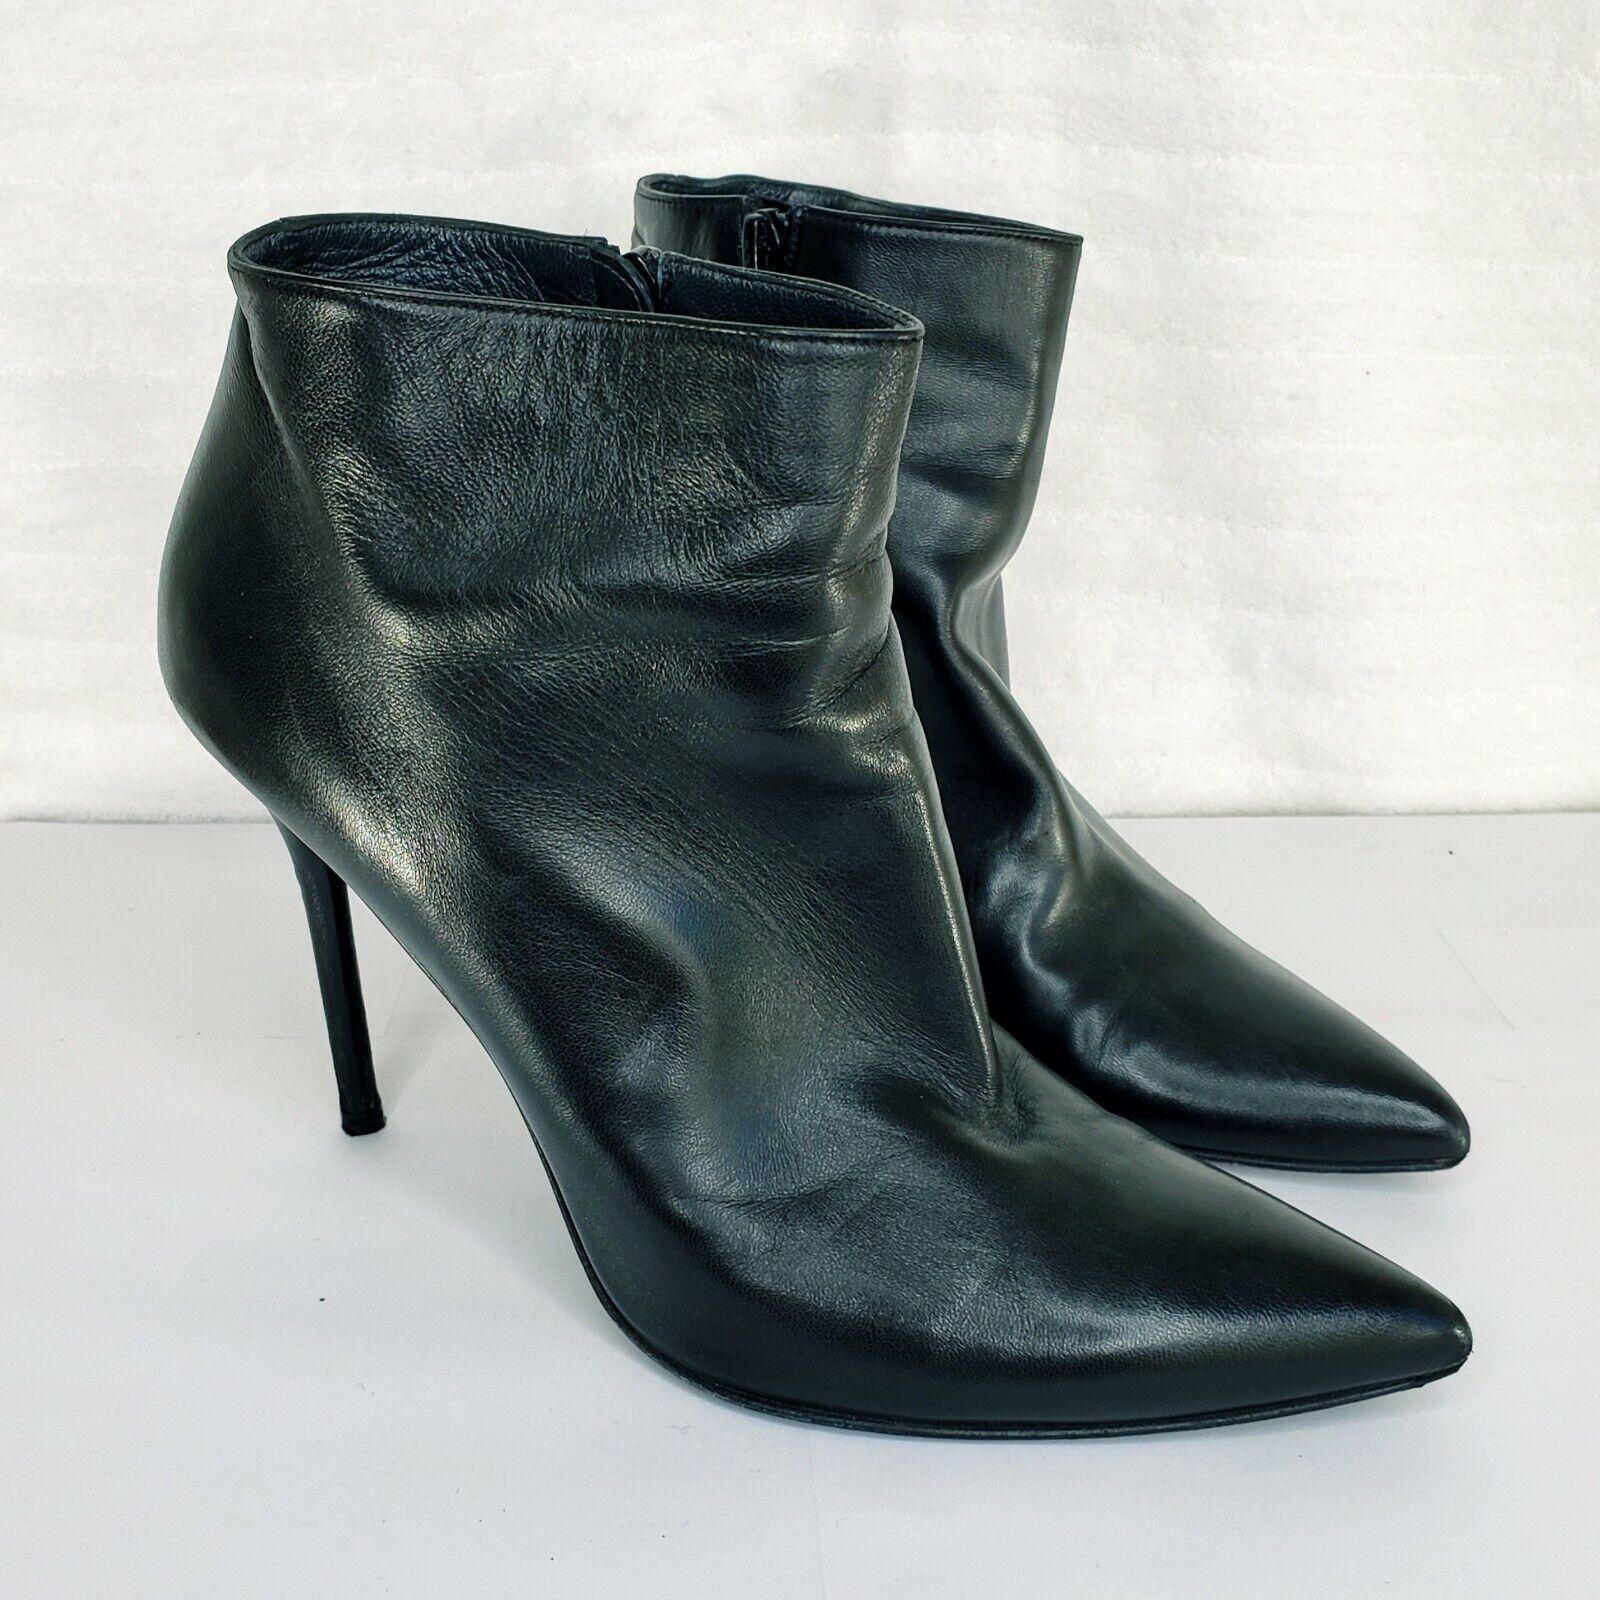 STUART WEITZMAN Womens Black Leather Zip High Heel Ankle Boots Size 9.5M QW16305